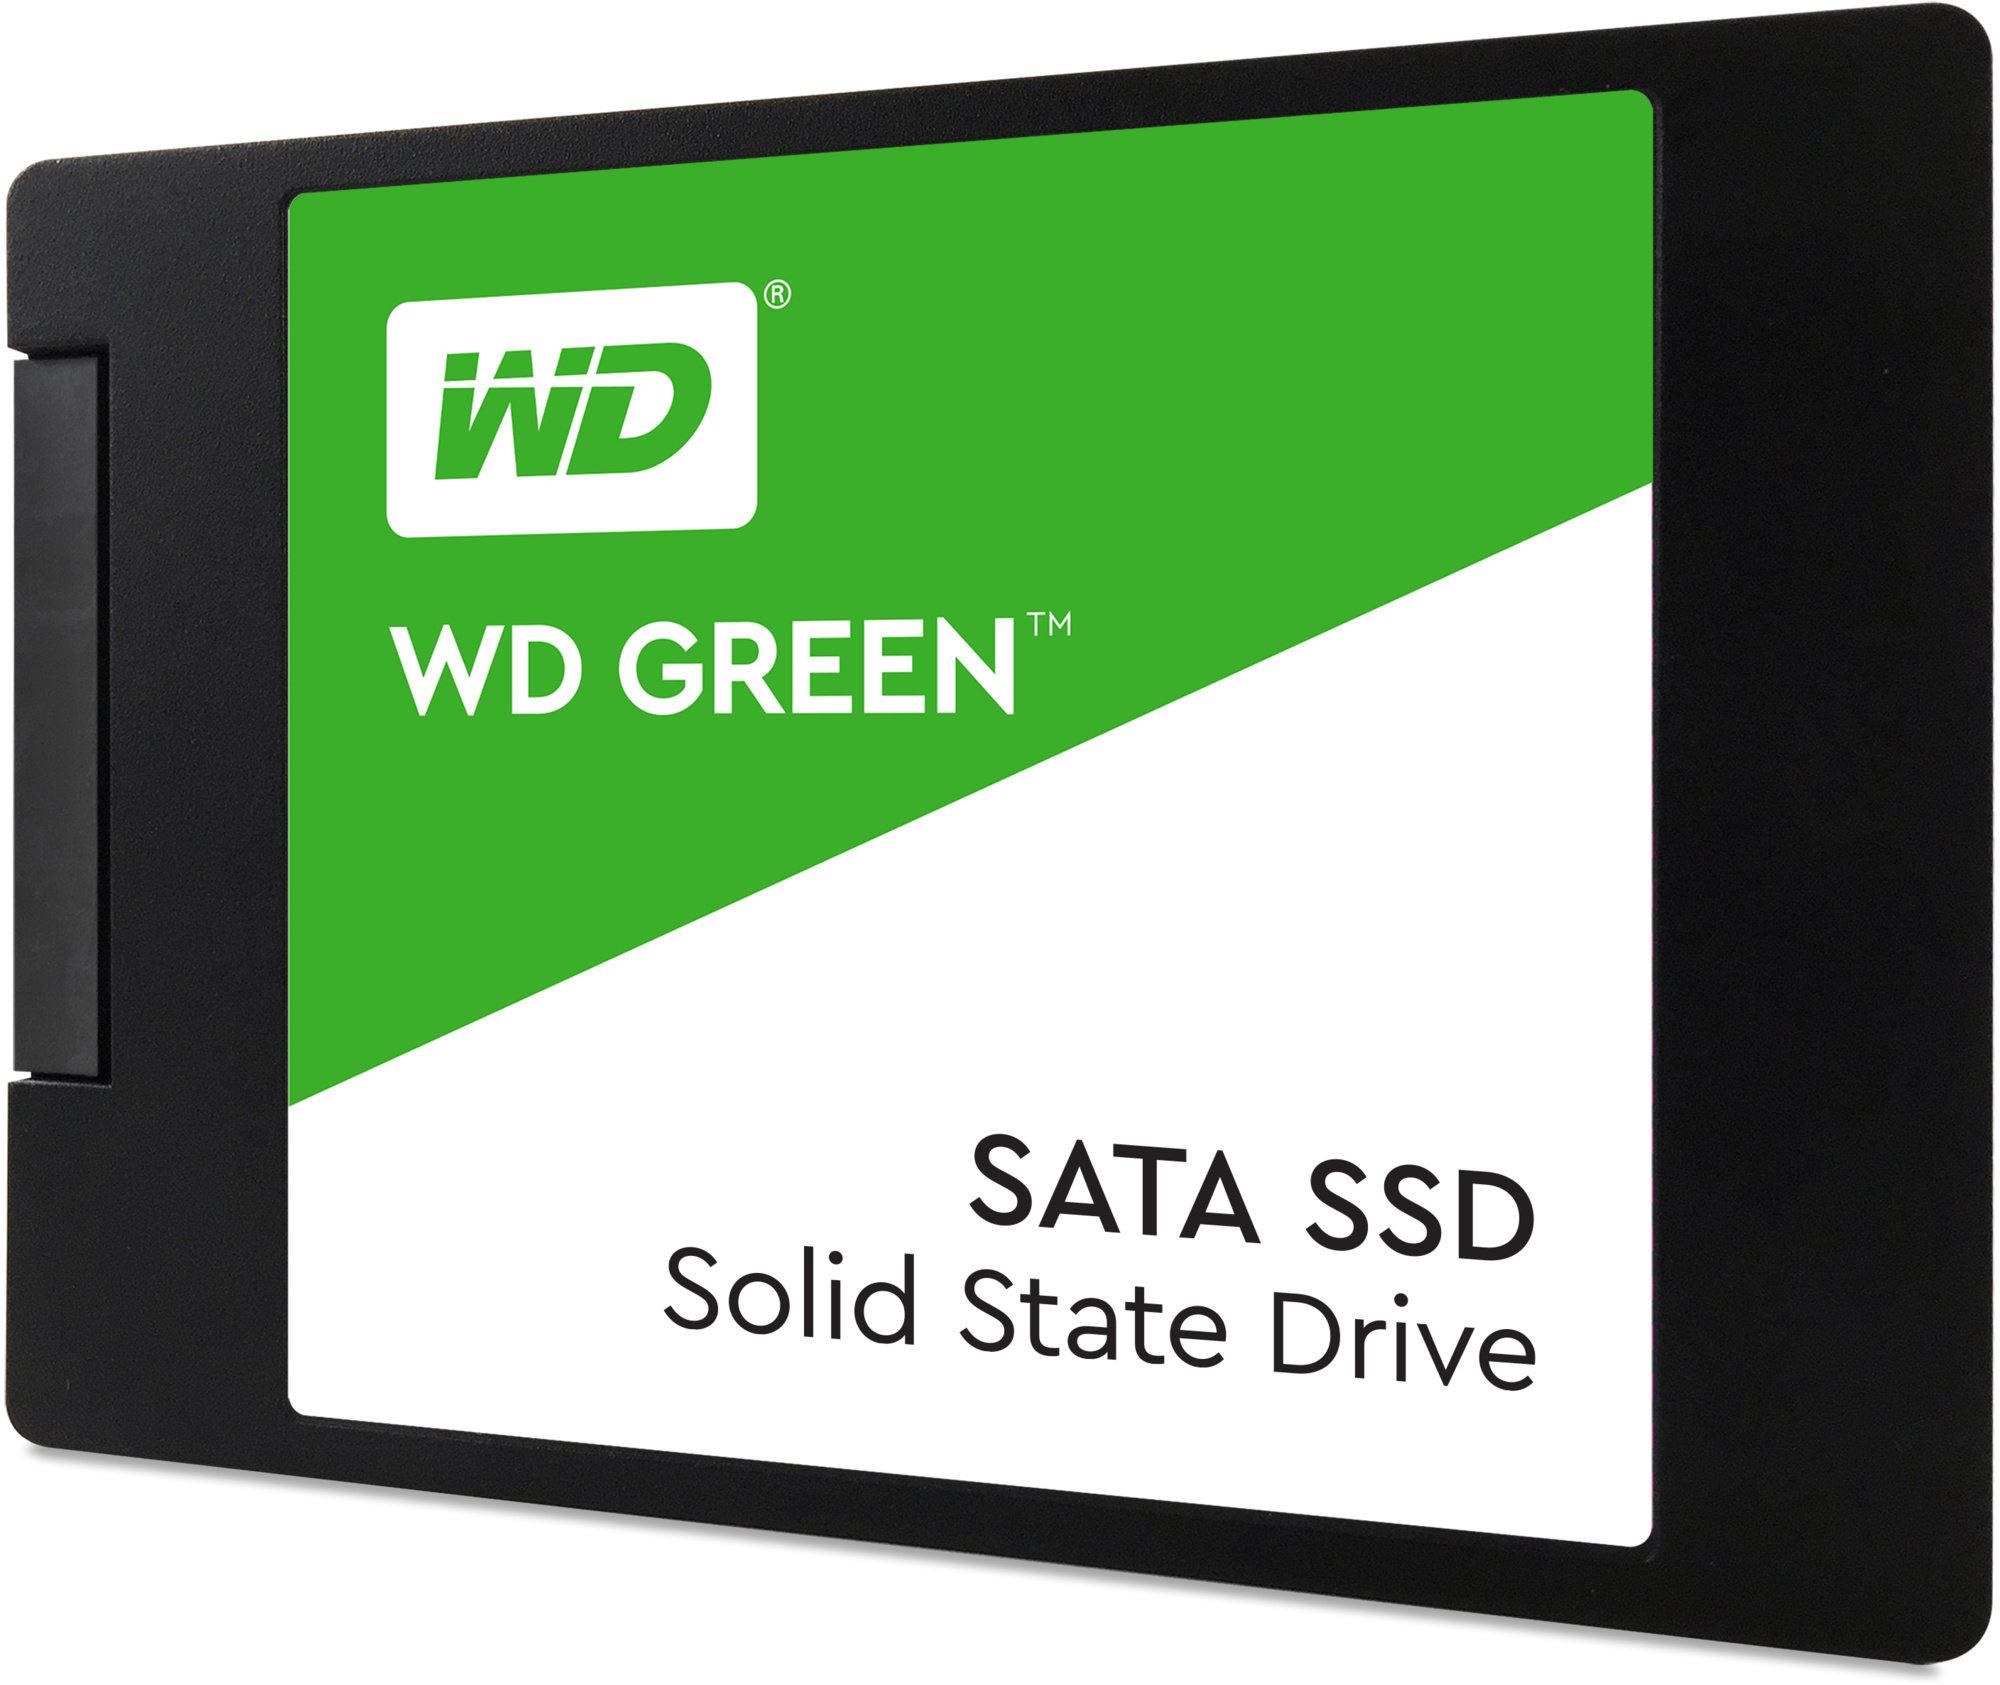 WD Green - 120 GB - 2.5